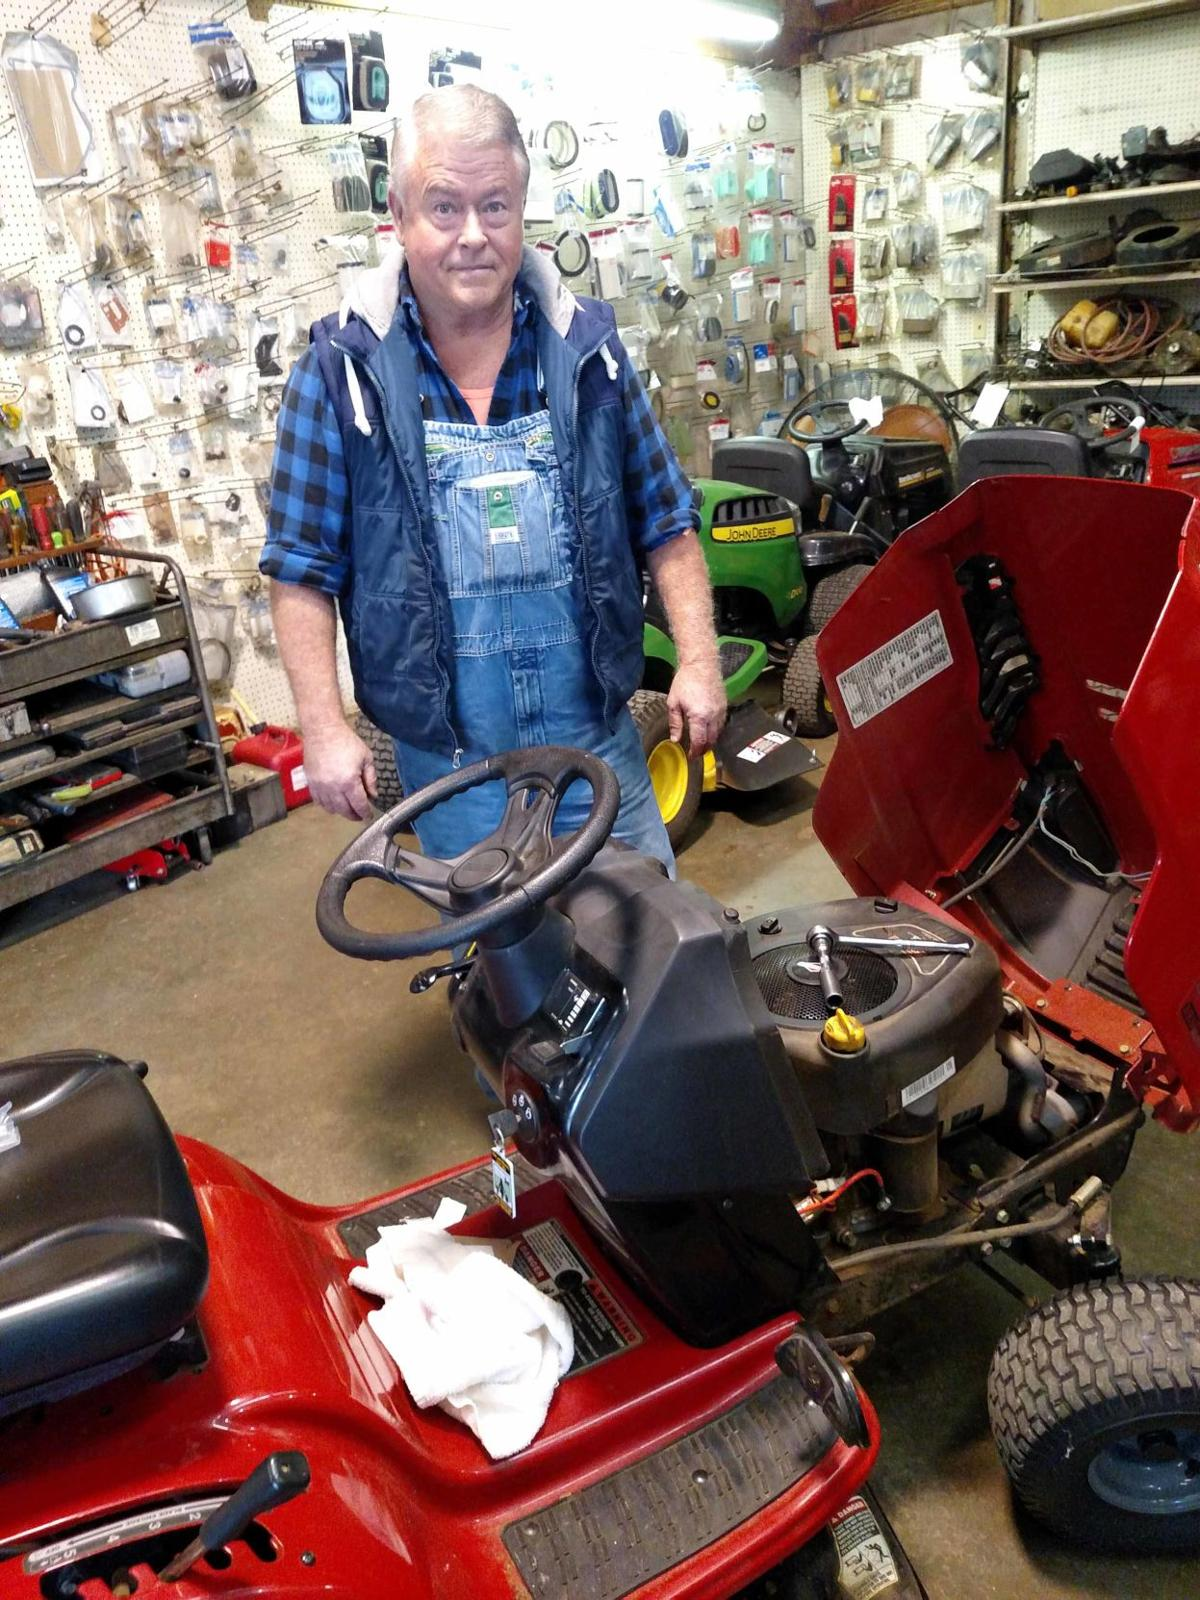 Business Spotlight: Ever the tinkerer, Napier can fix it all